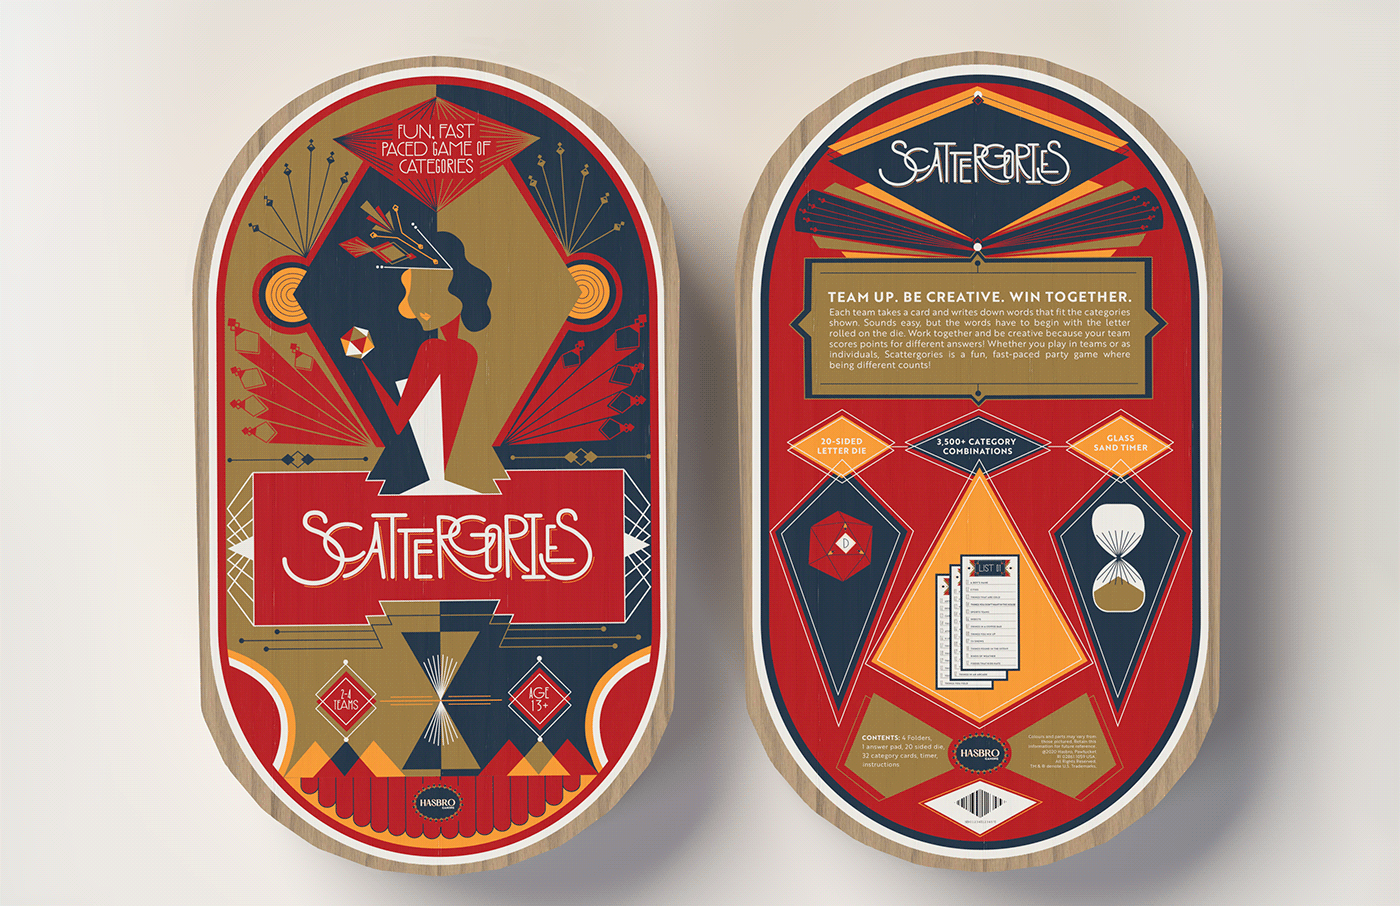 art deco board game dimensions game design  ILLUSTRATION  package design  Packaging scattergories